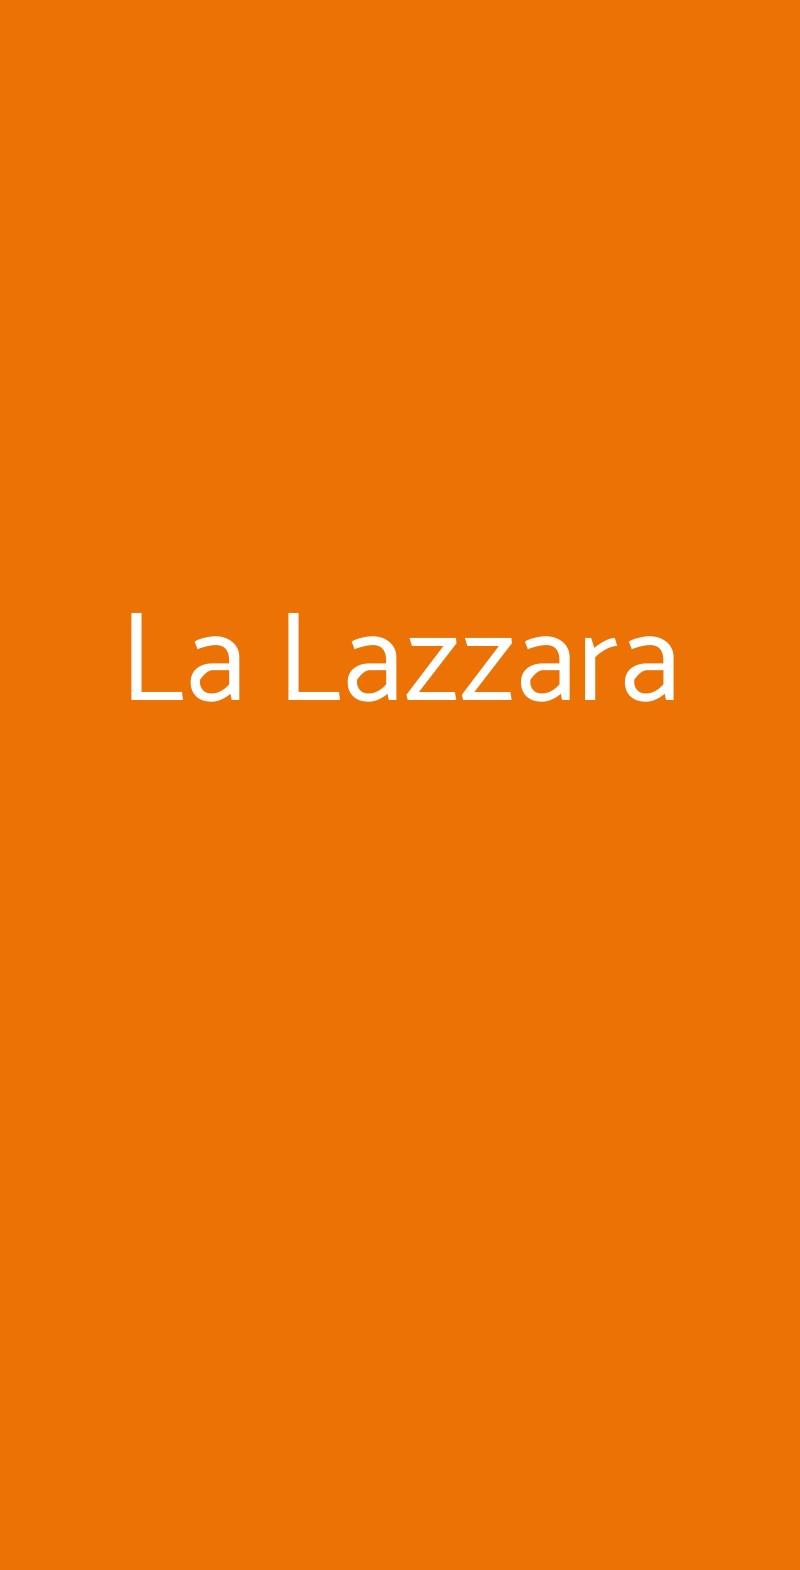 La Lazzara Napoli menù 1 pagina